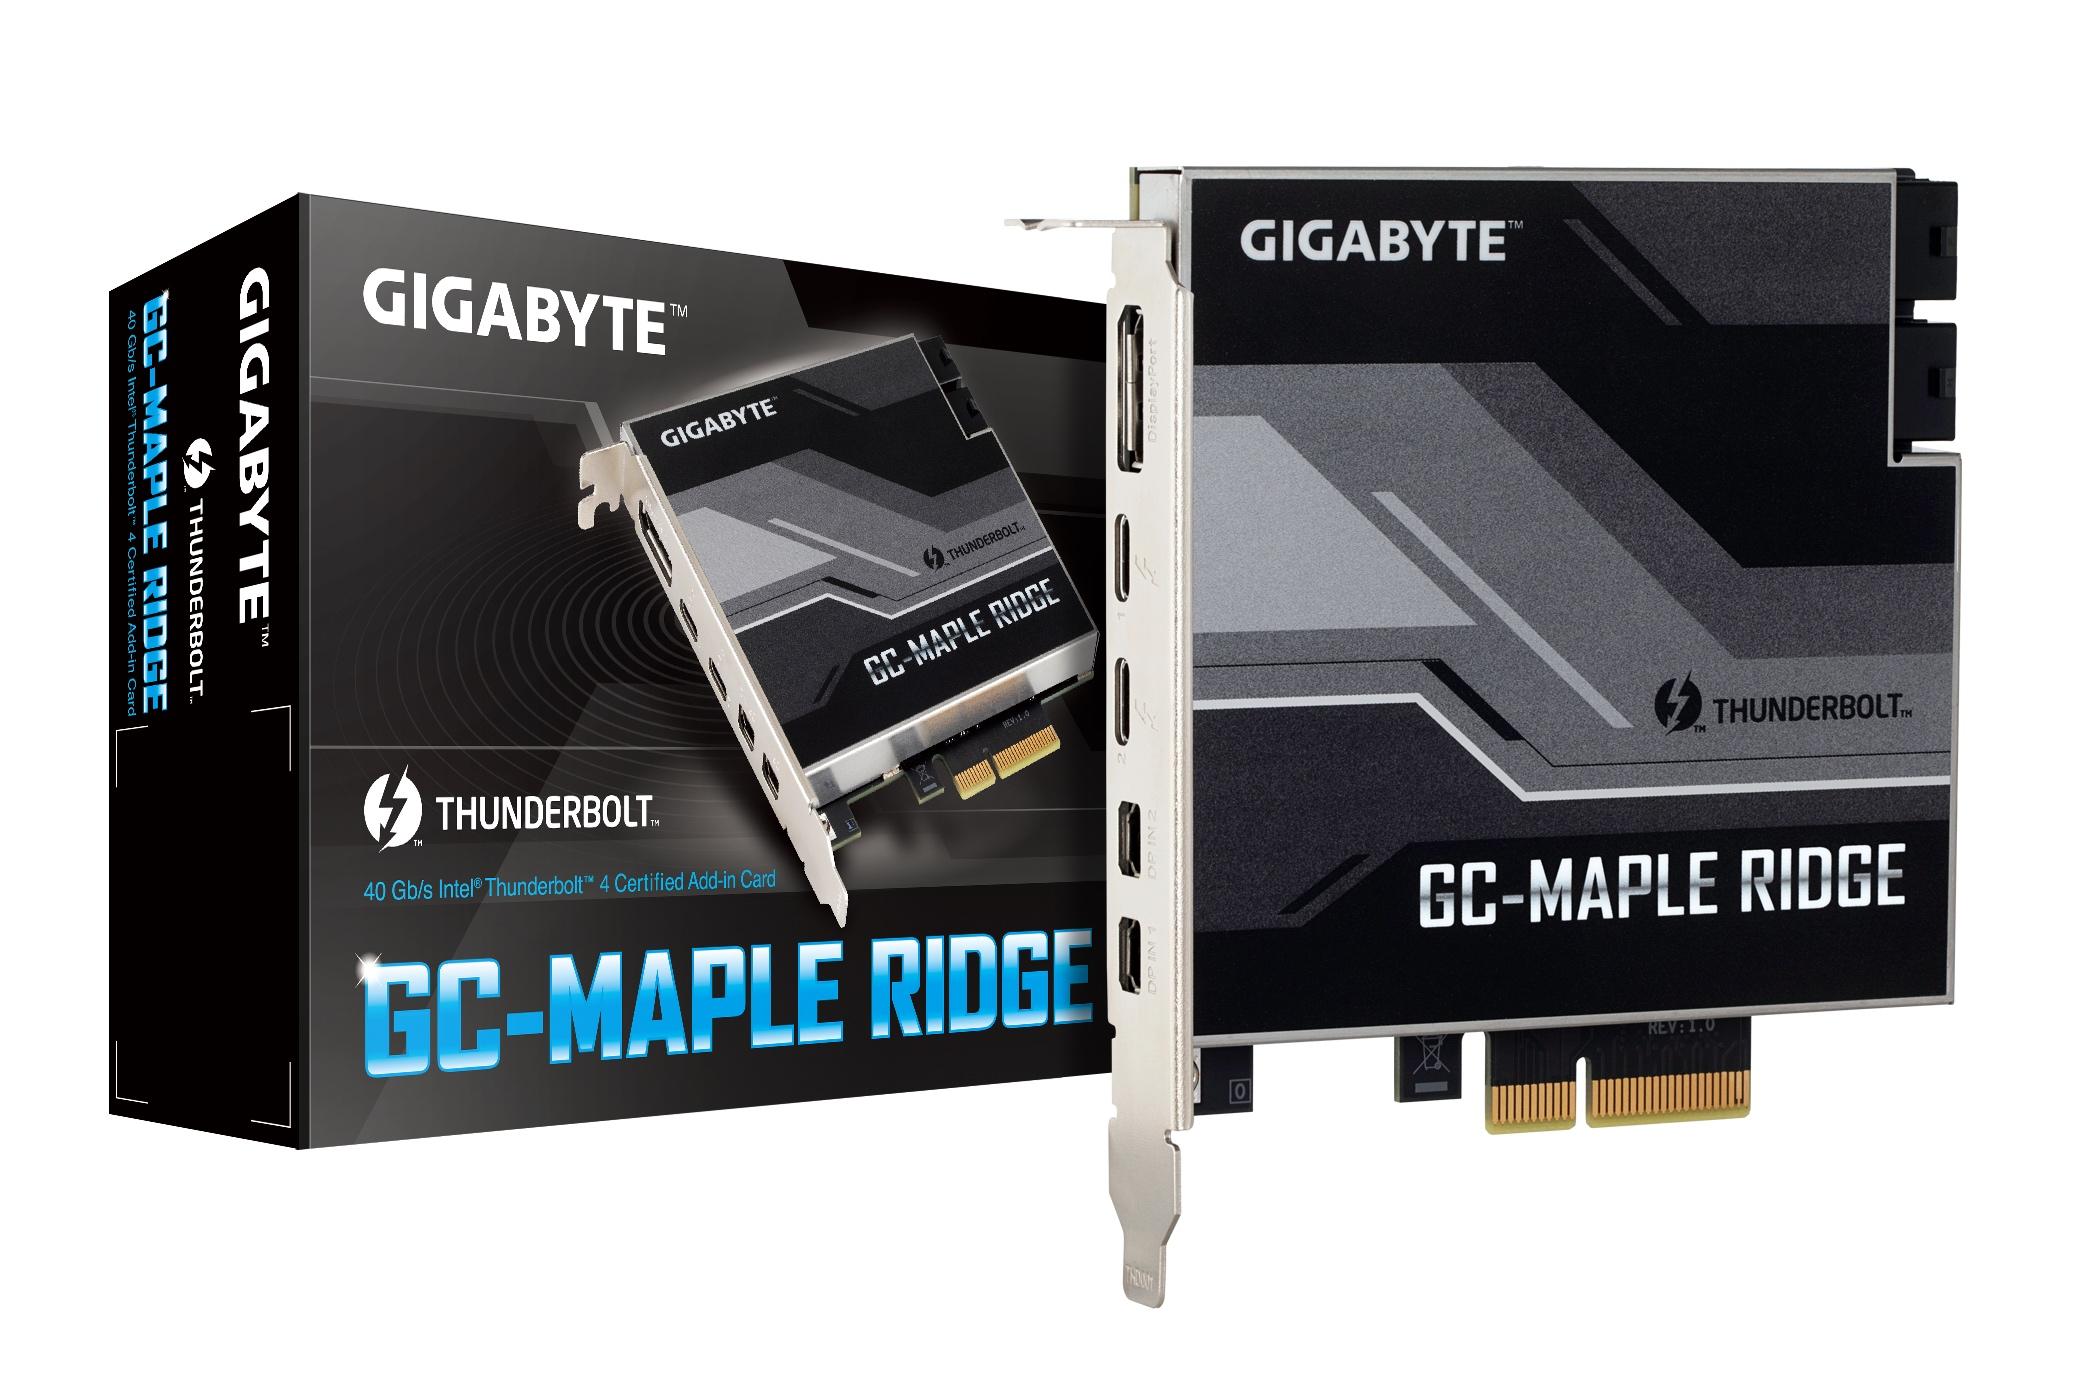 GC-MAPLE RIDGE